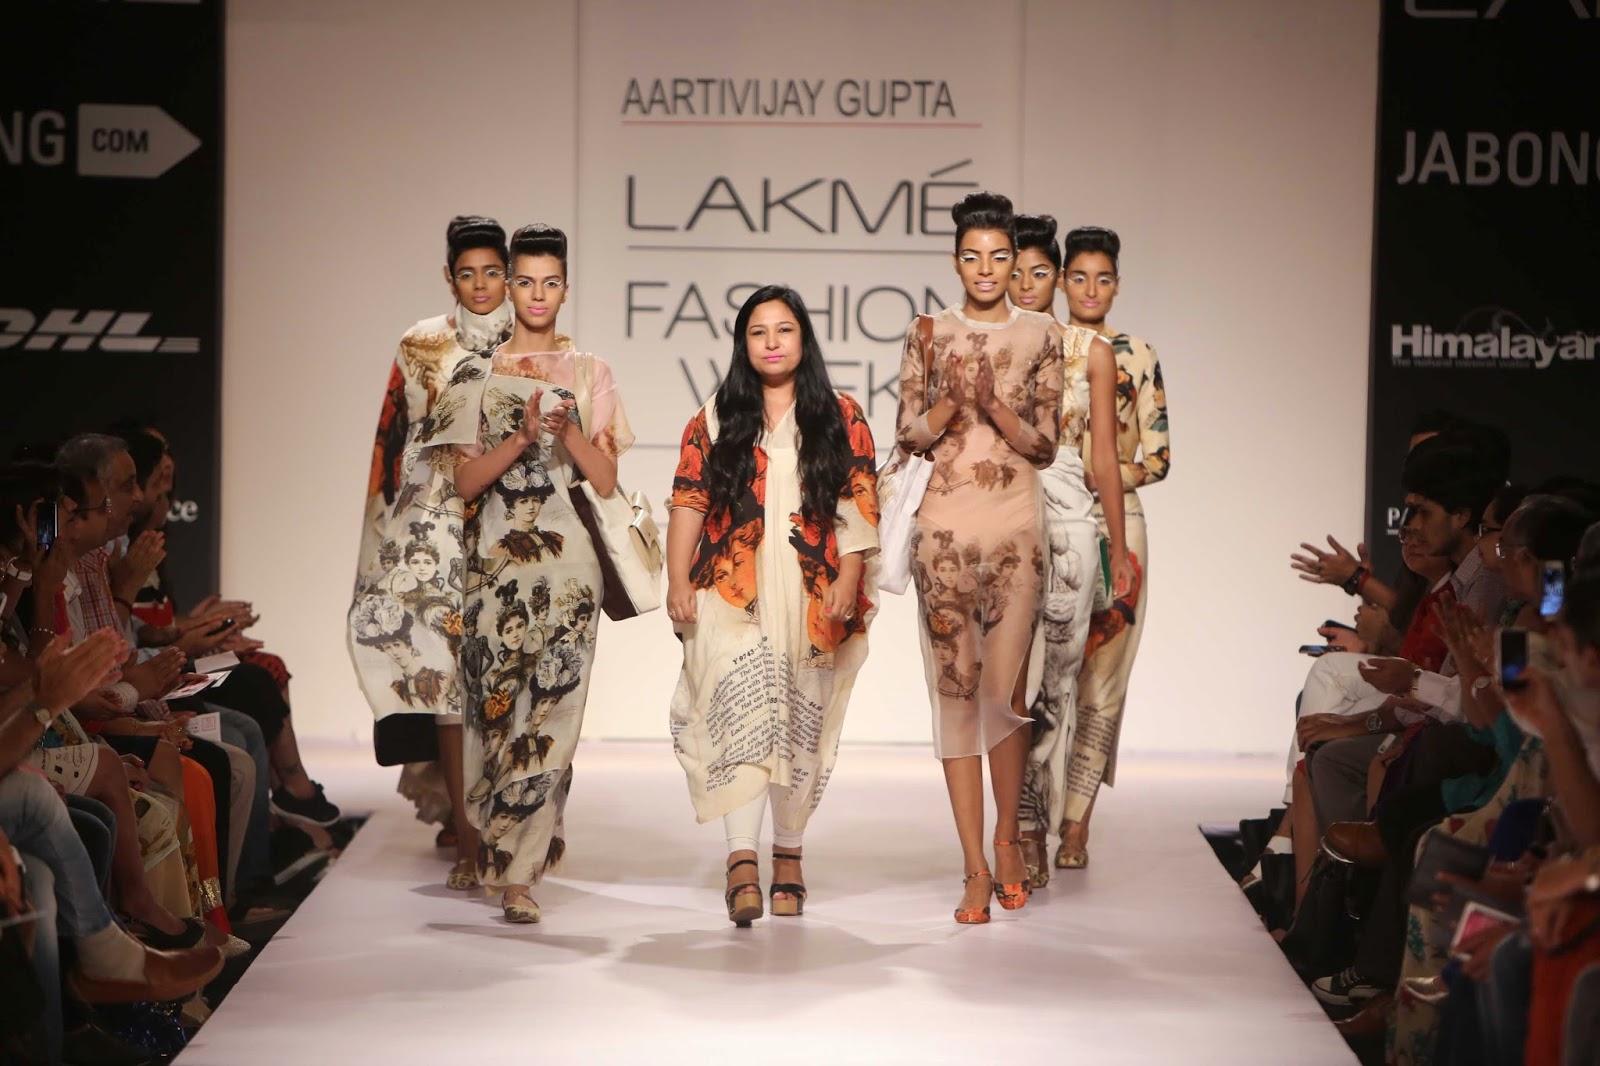 http://aquaintperspective.blogspot.in/, AartiVijay Gupta